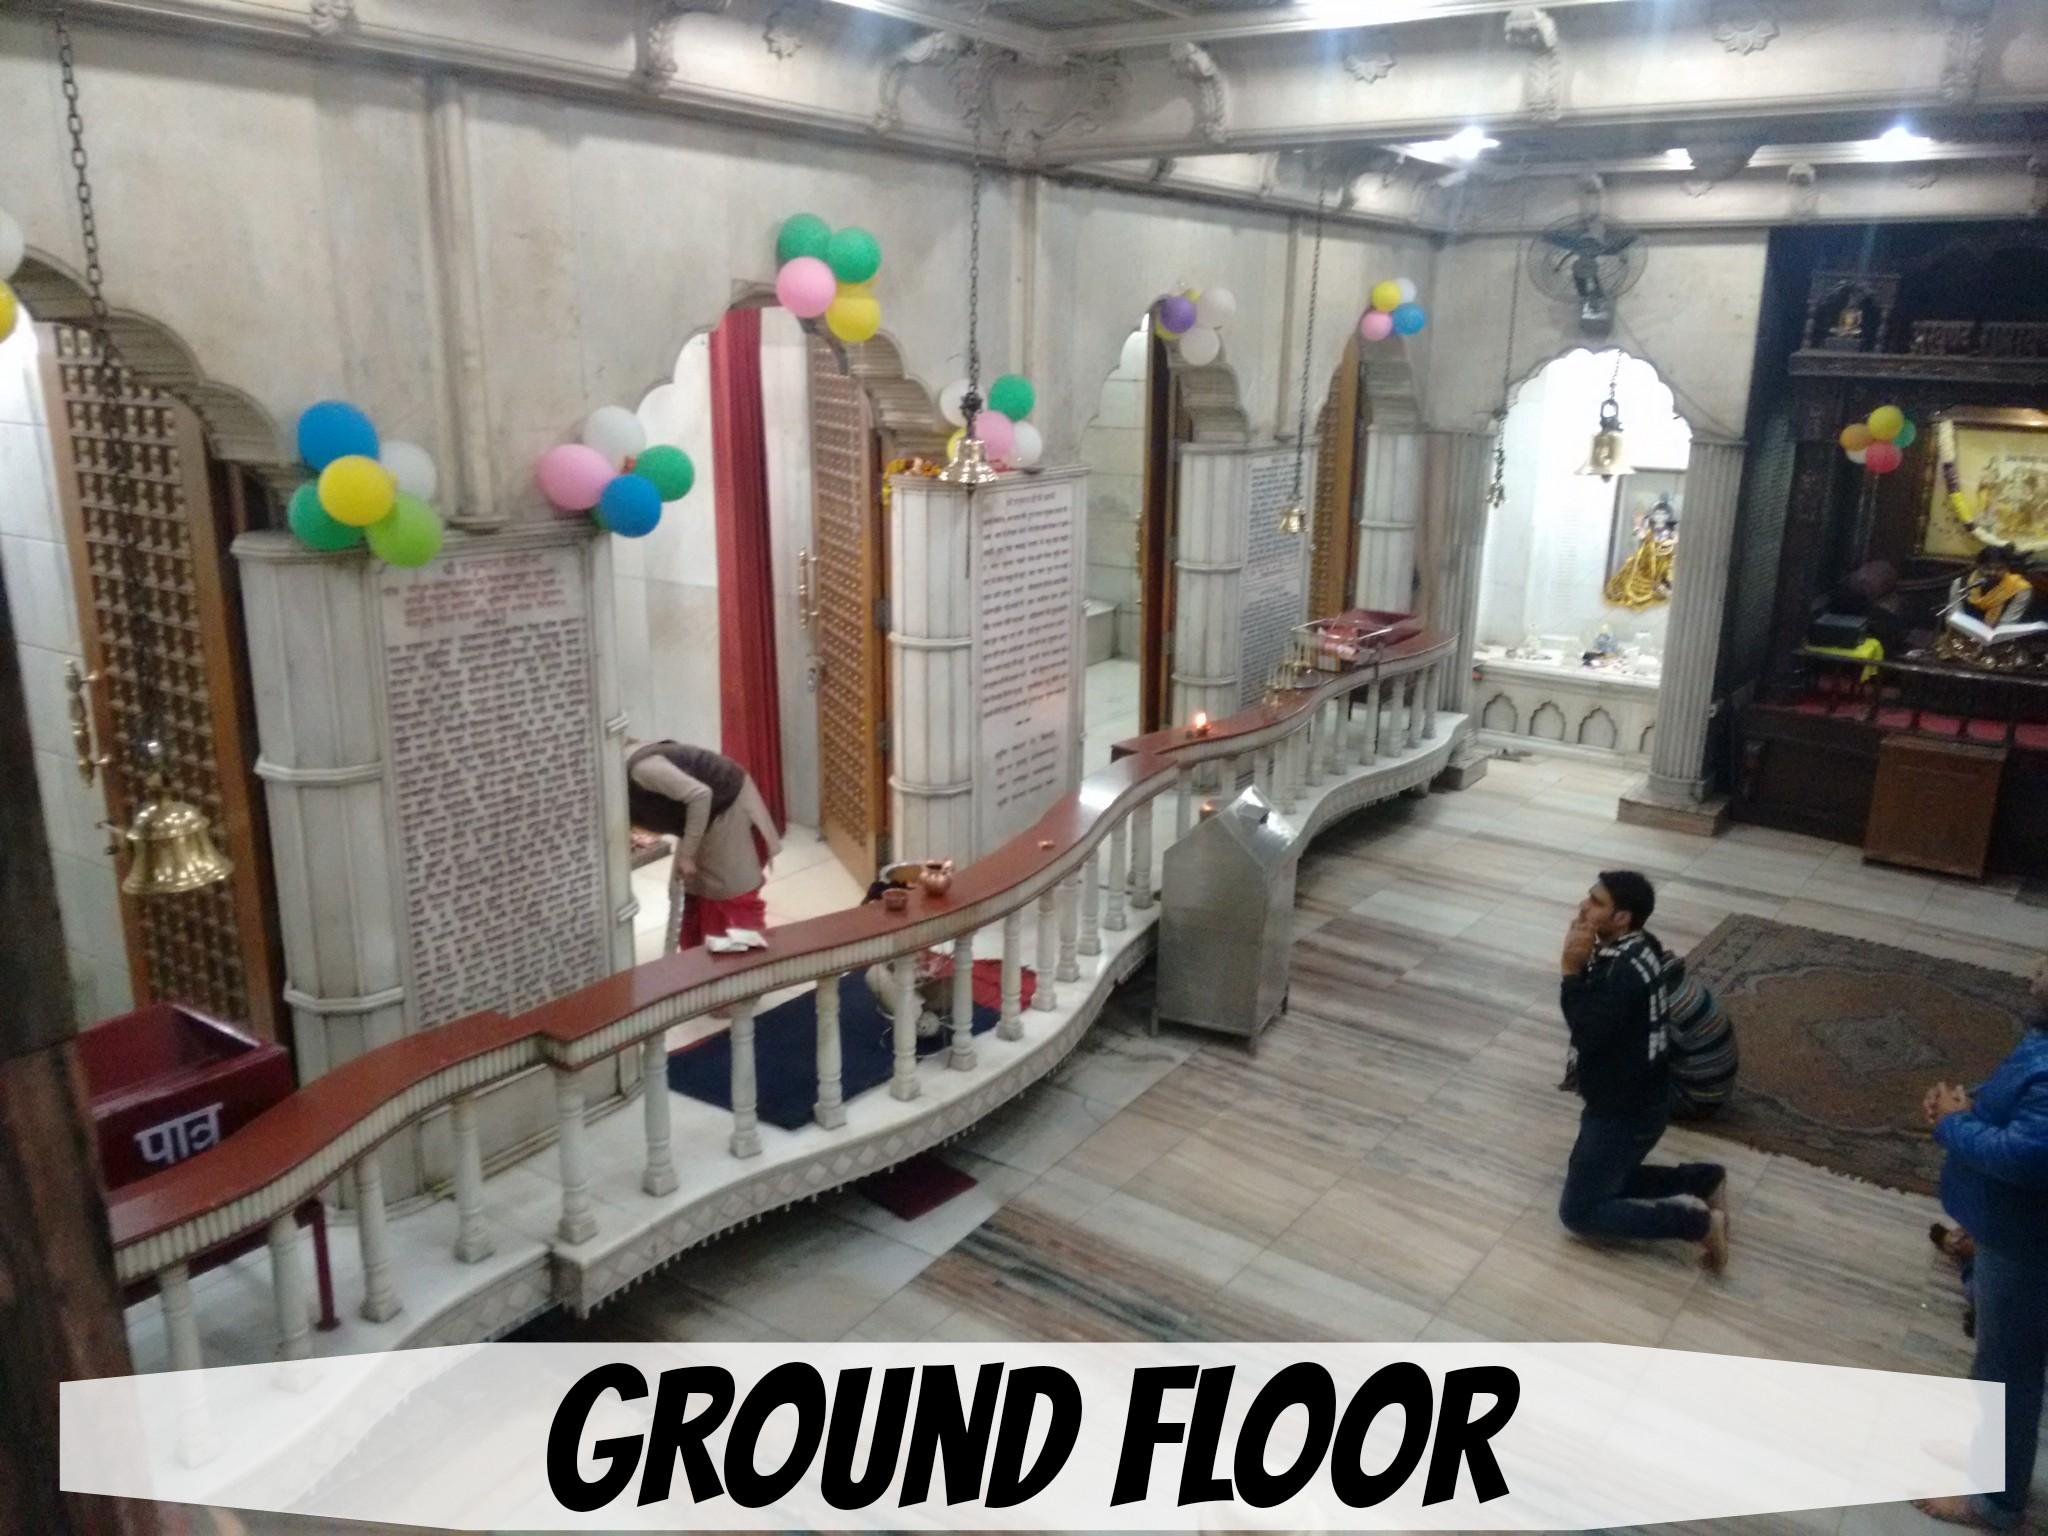 THE GROUND FLOOR OF THE MANDIR